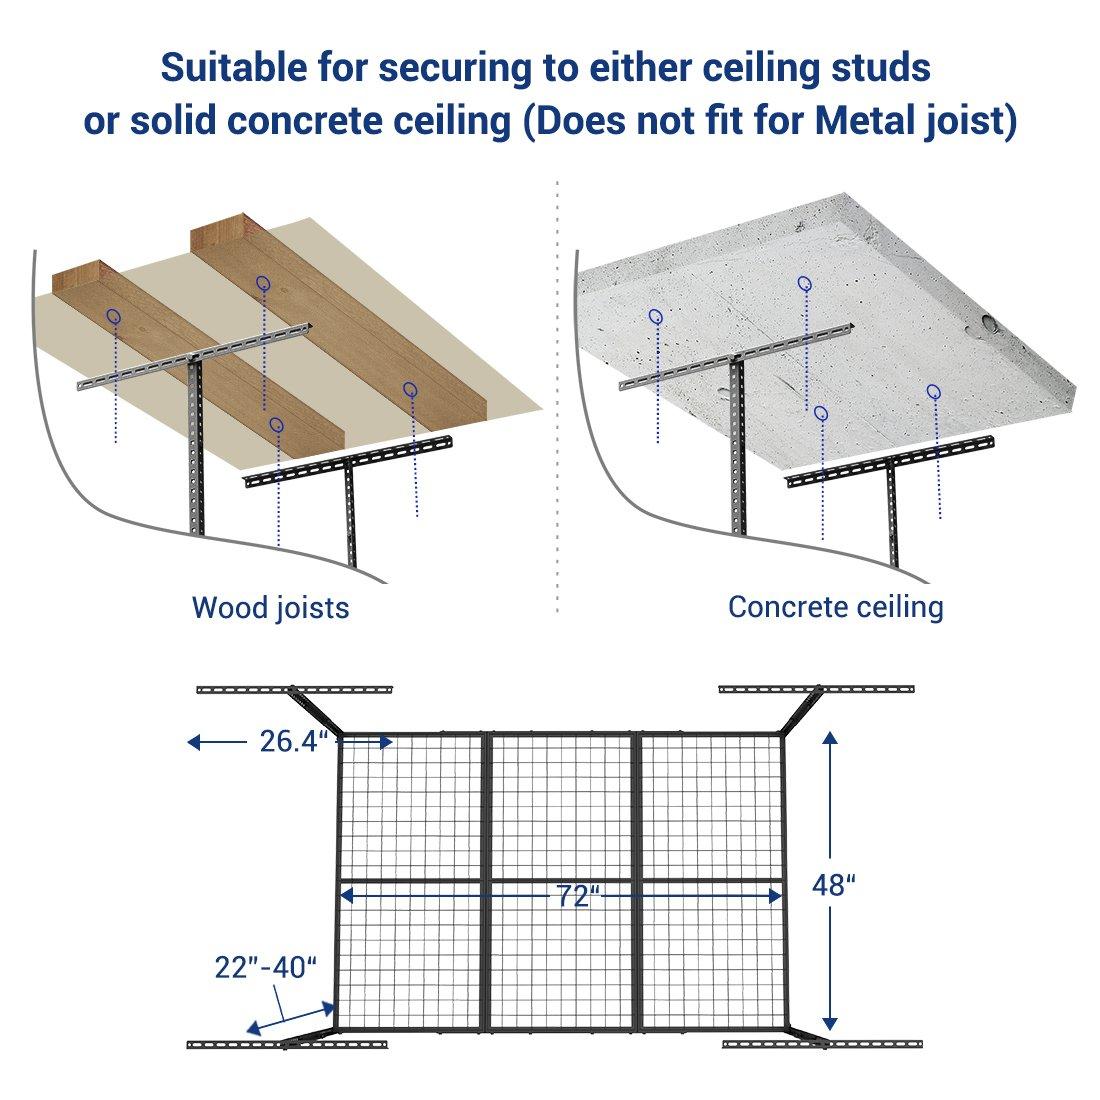 FLEXIMOUNTS 4x6 Heavy Duty Overhead Garage Adjustable Ceiling Storage Rack, 72'' Length x 48'' Width x 40'' Height, Black by FLEXIMOUNTS (Image #6)